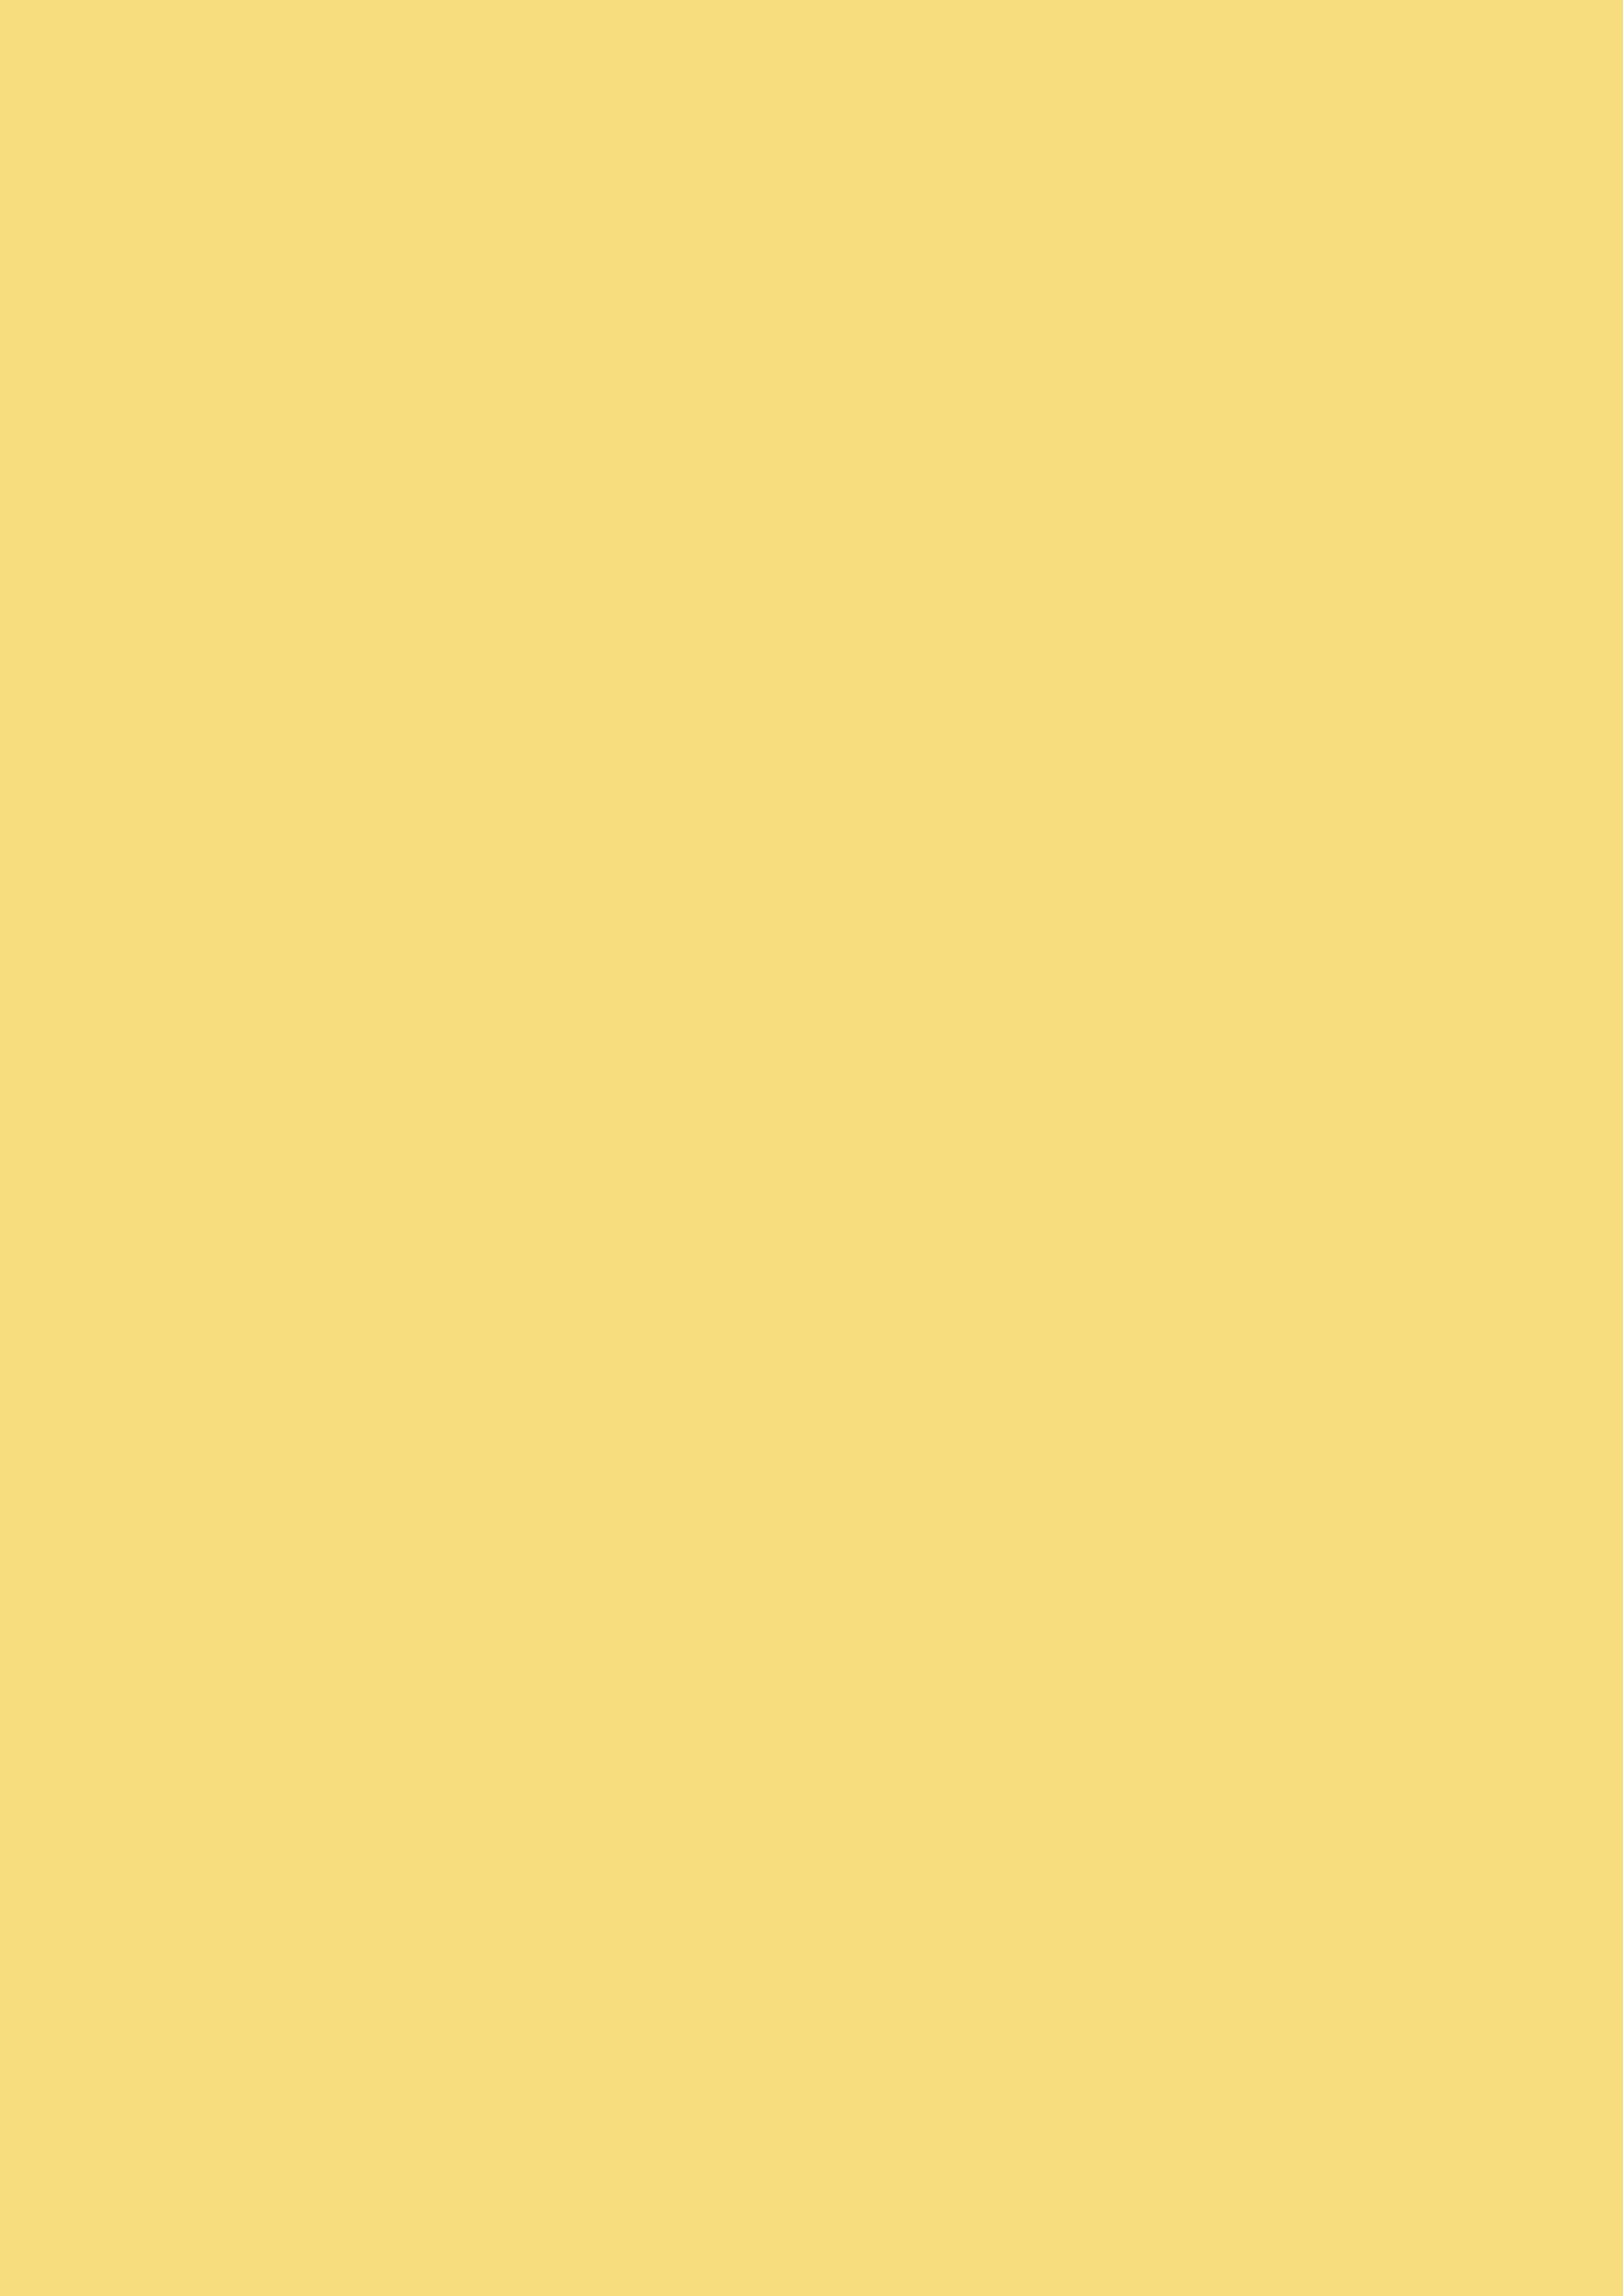 2480x3508 Jasmine Solid Color Background